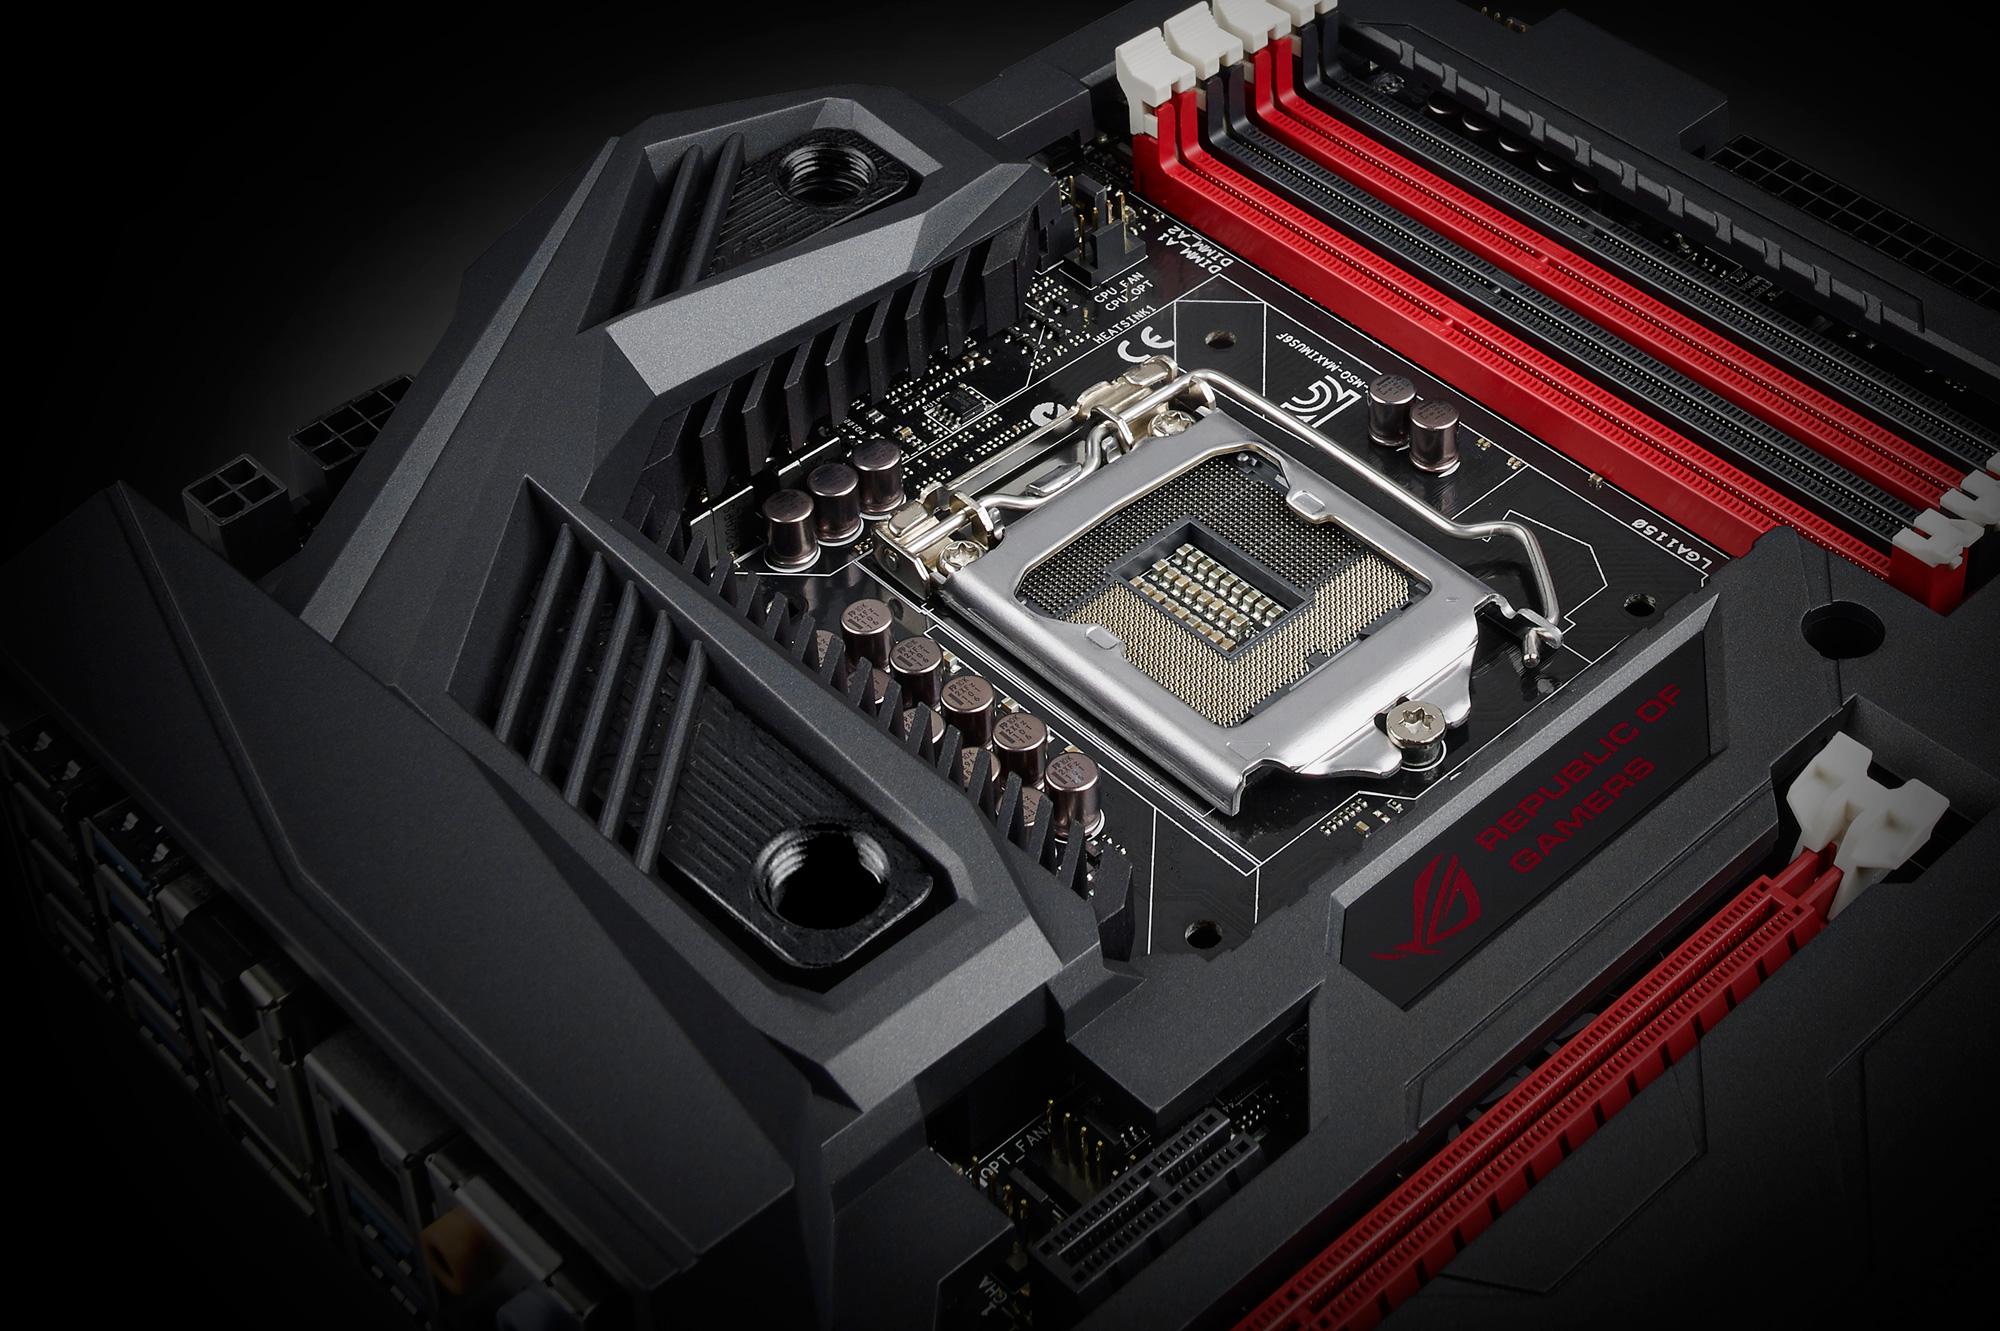 ASUS Republic of Gamers Introduces Maximus VI Formula Motherboard 2000x1331